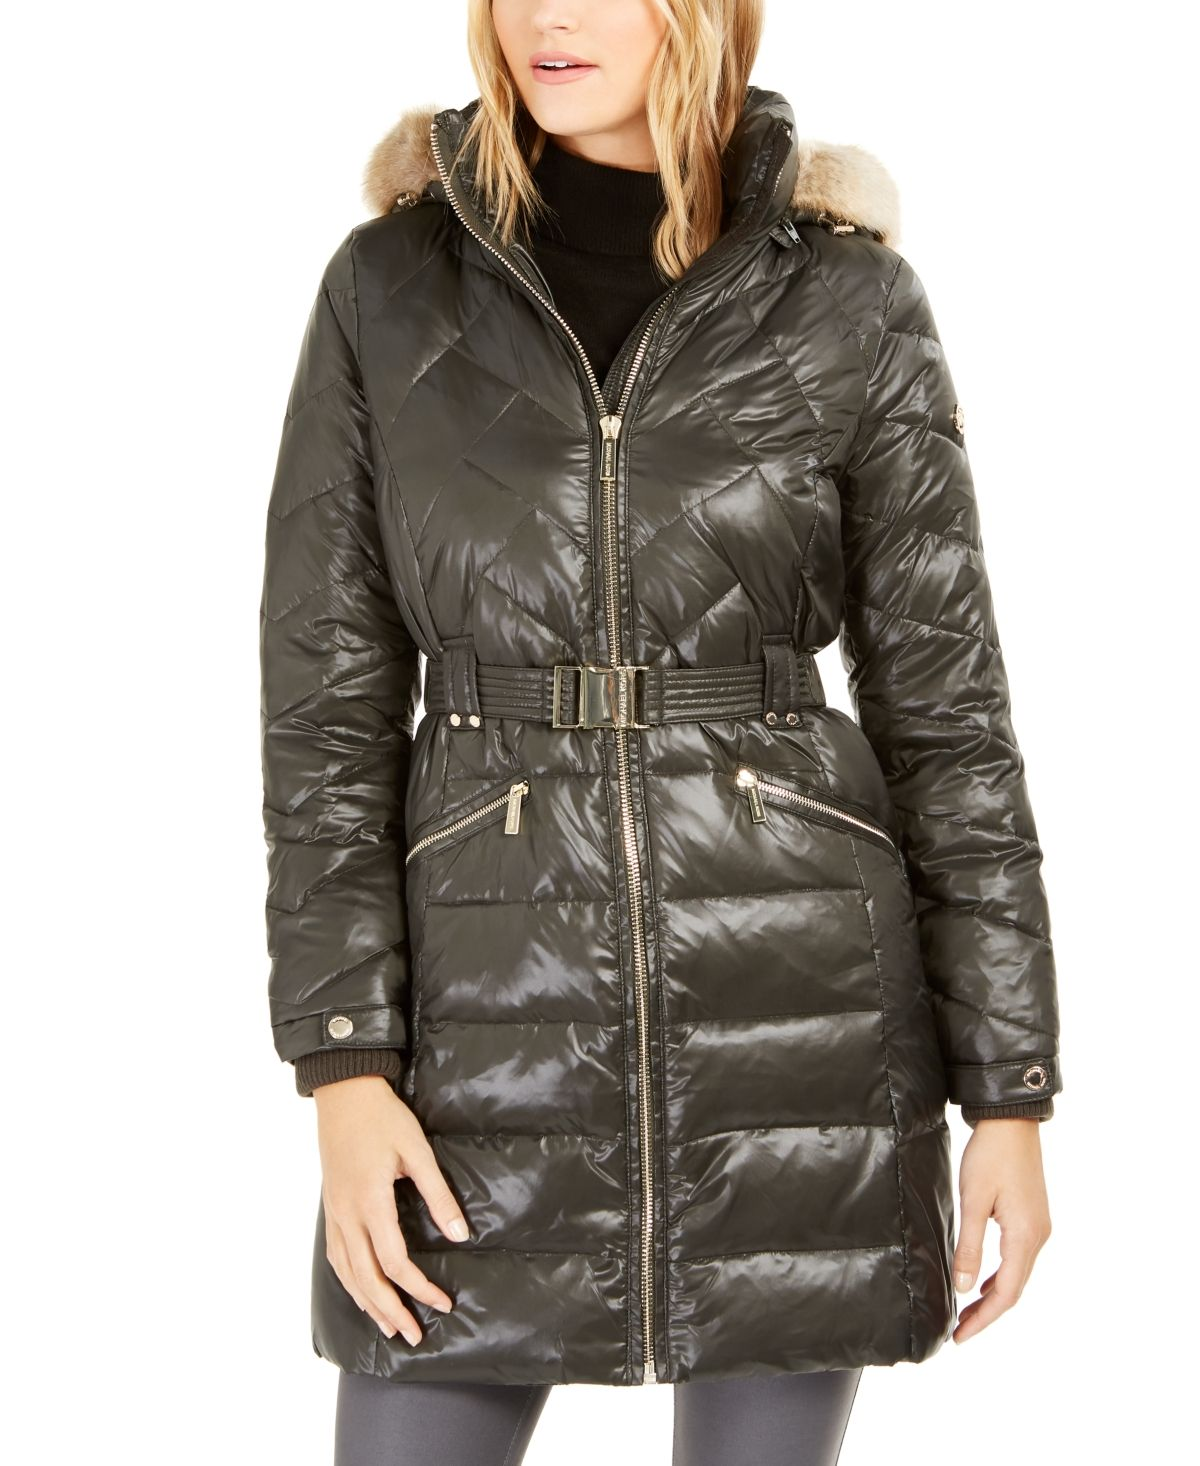 Michael Kors Hooded Down Puffer Coat With FauxFur Trim